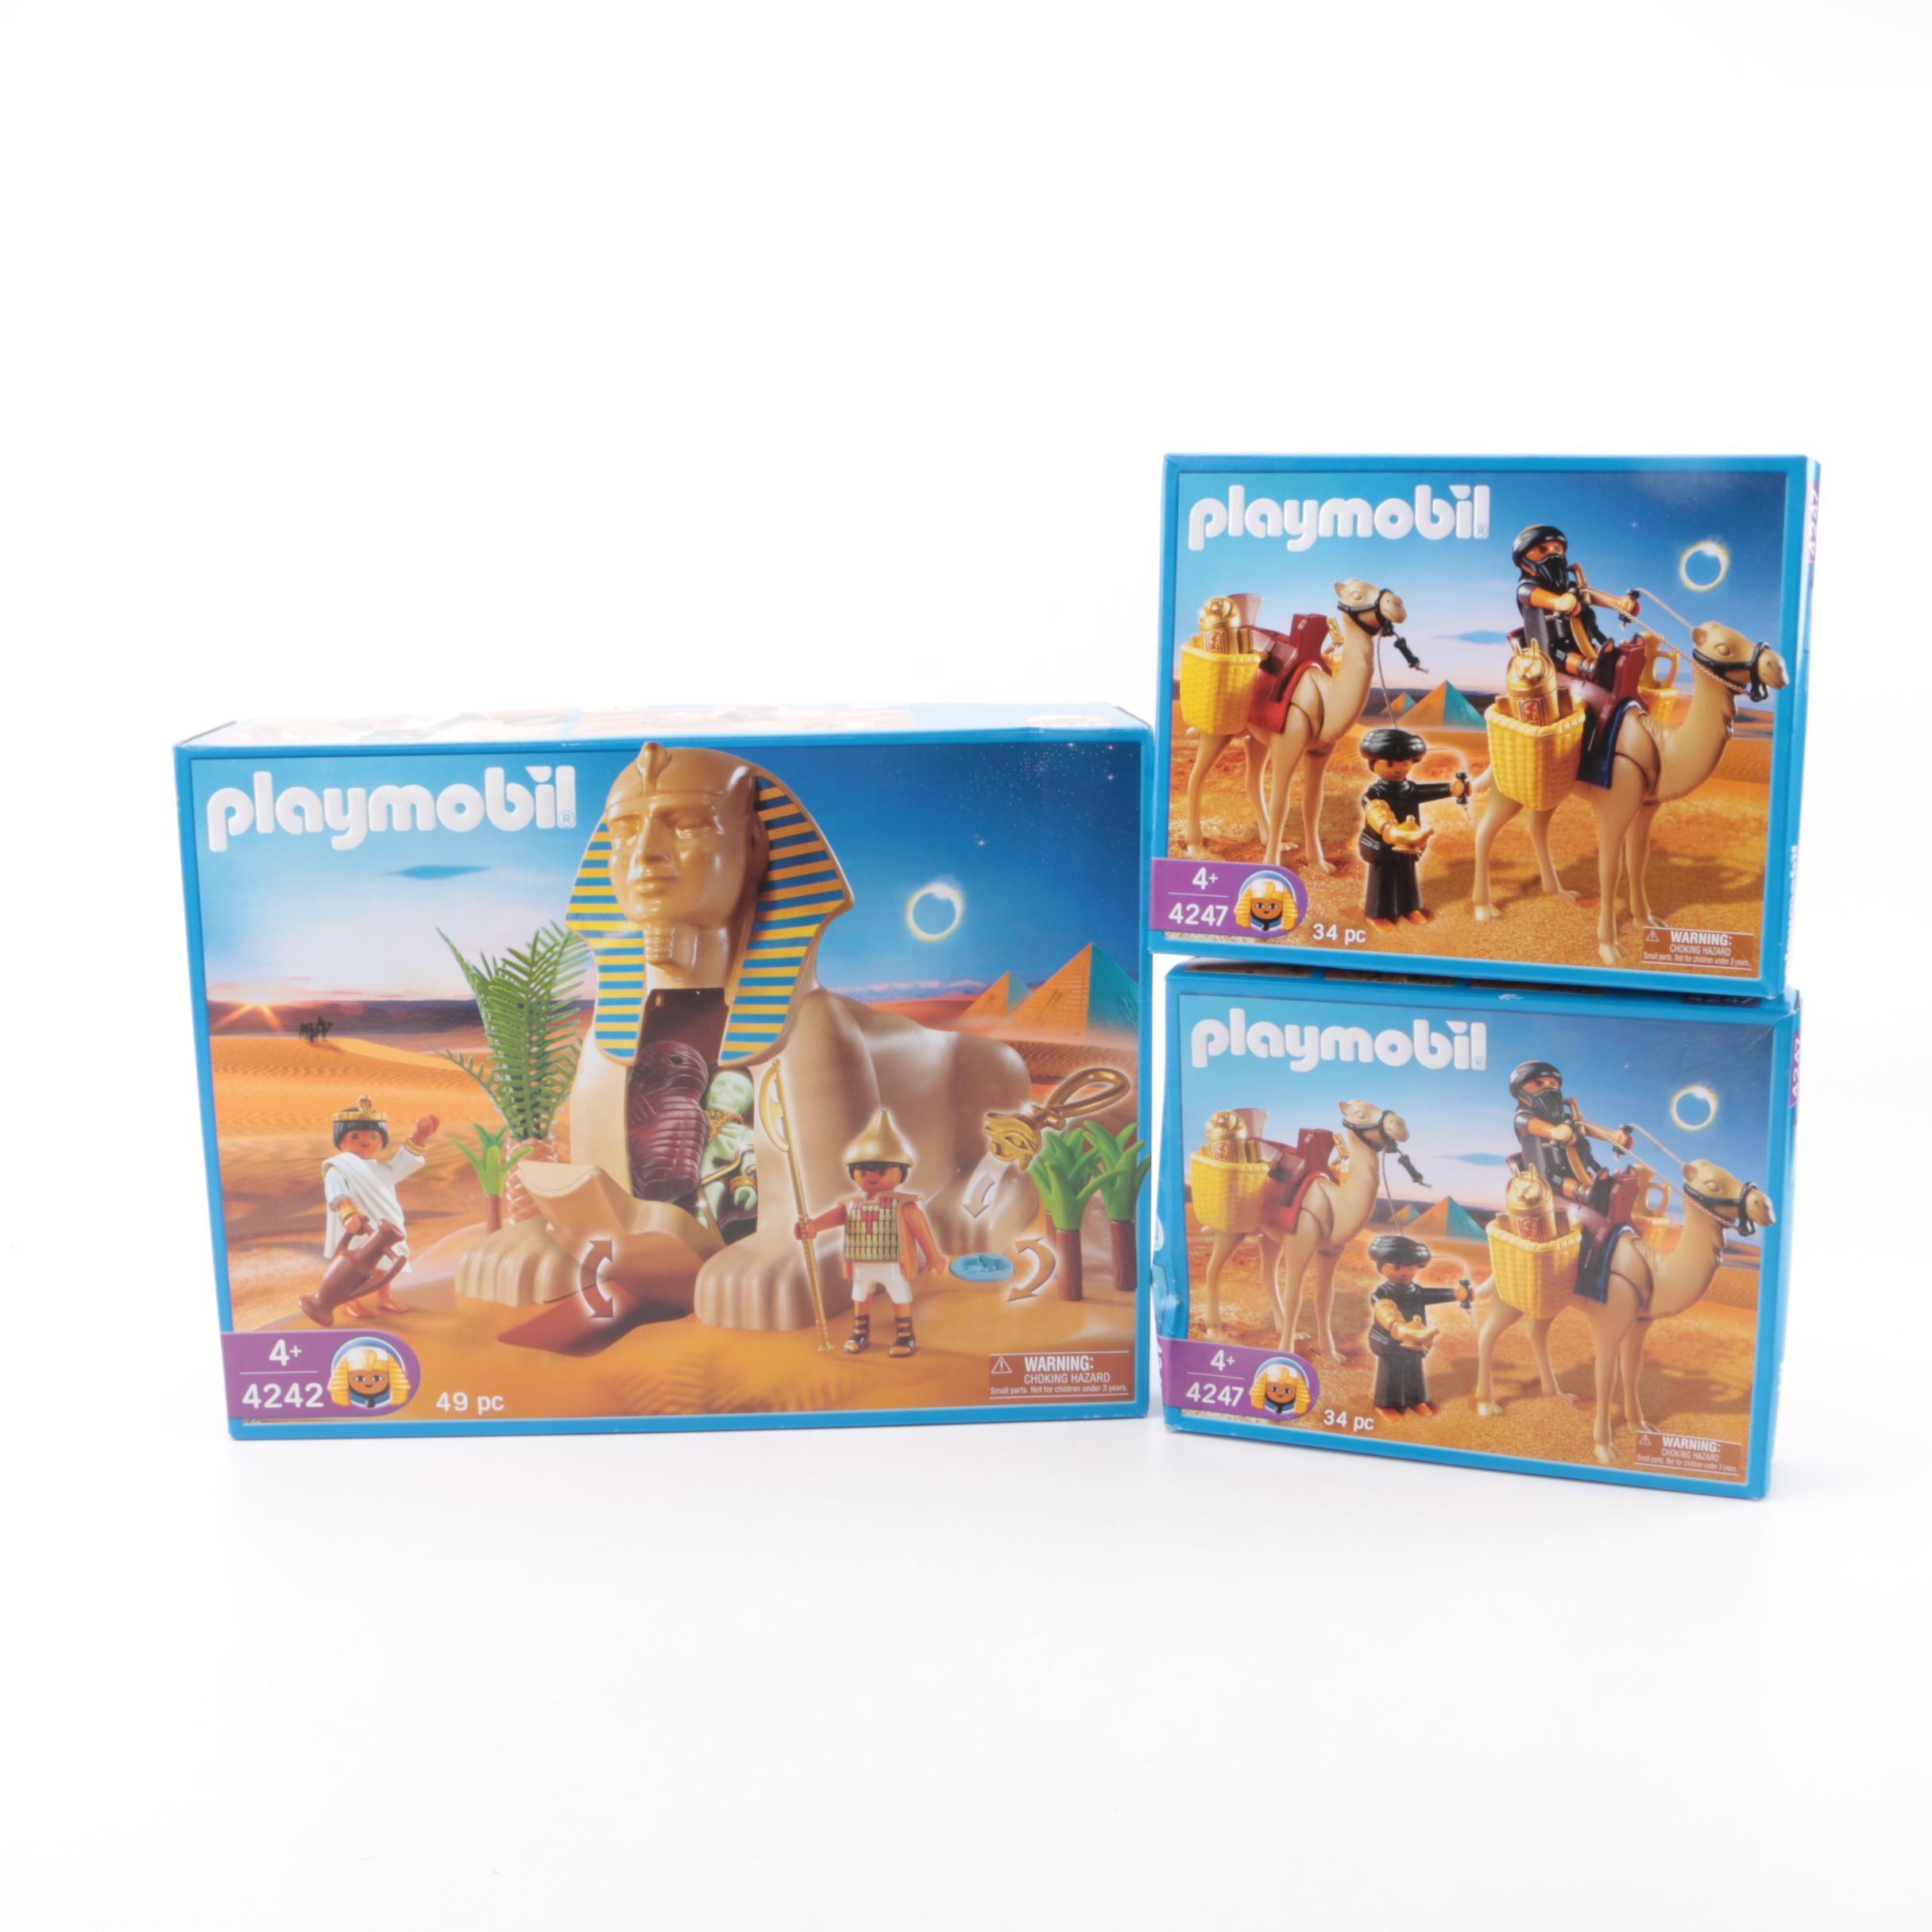 Playmobil Egyptian Themed Sets